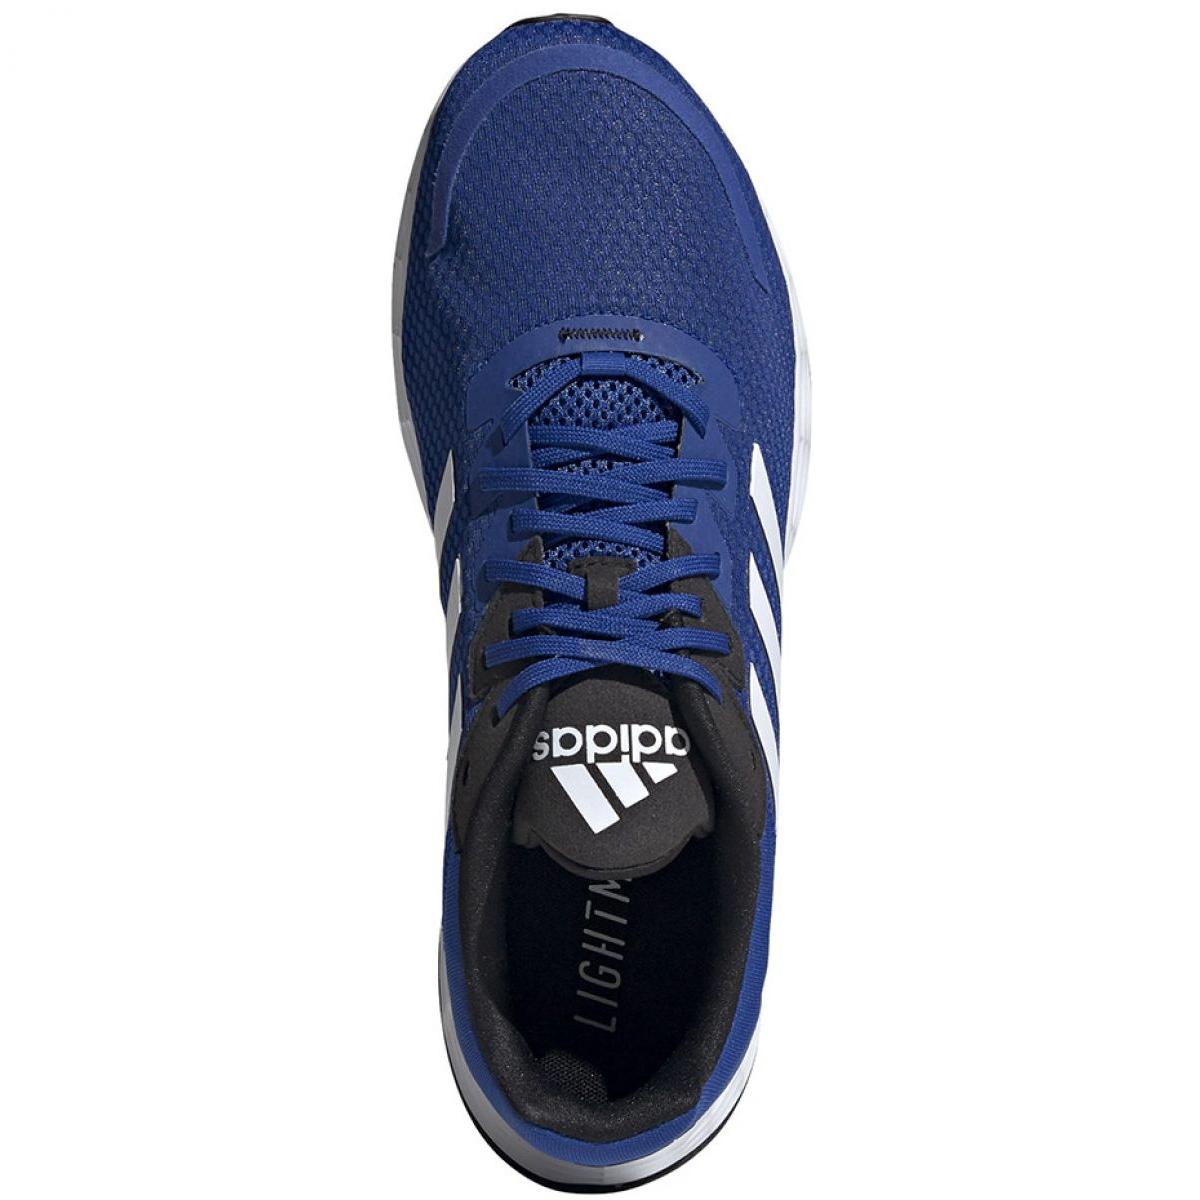 Adidas Duramo Sl M FW8678 running shoes black blue